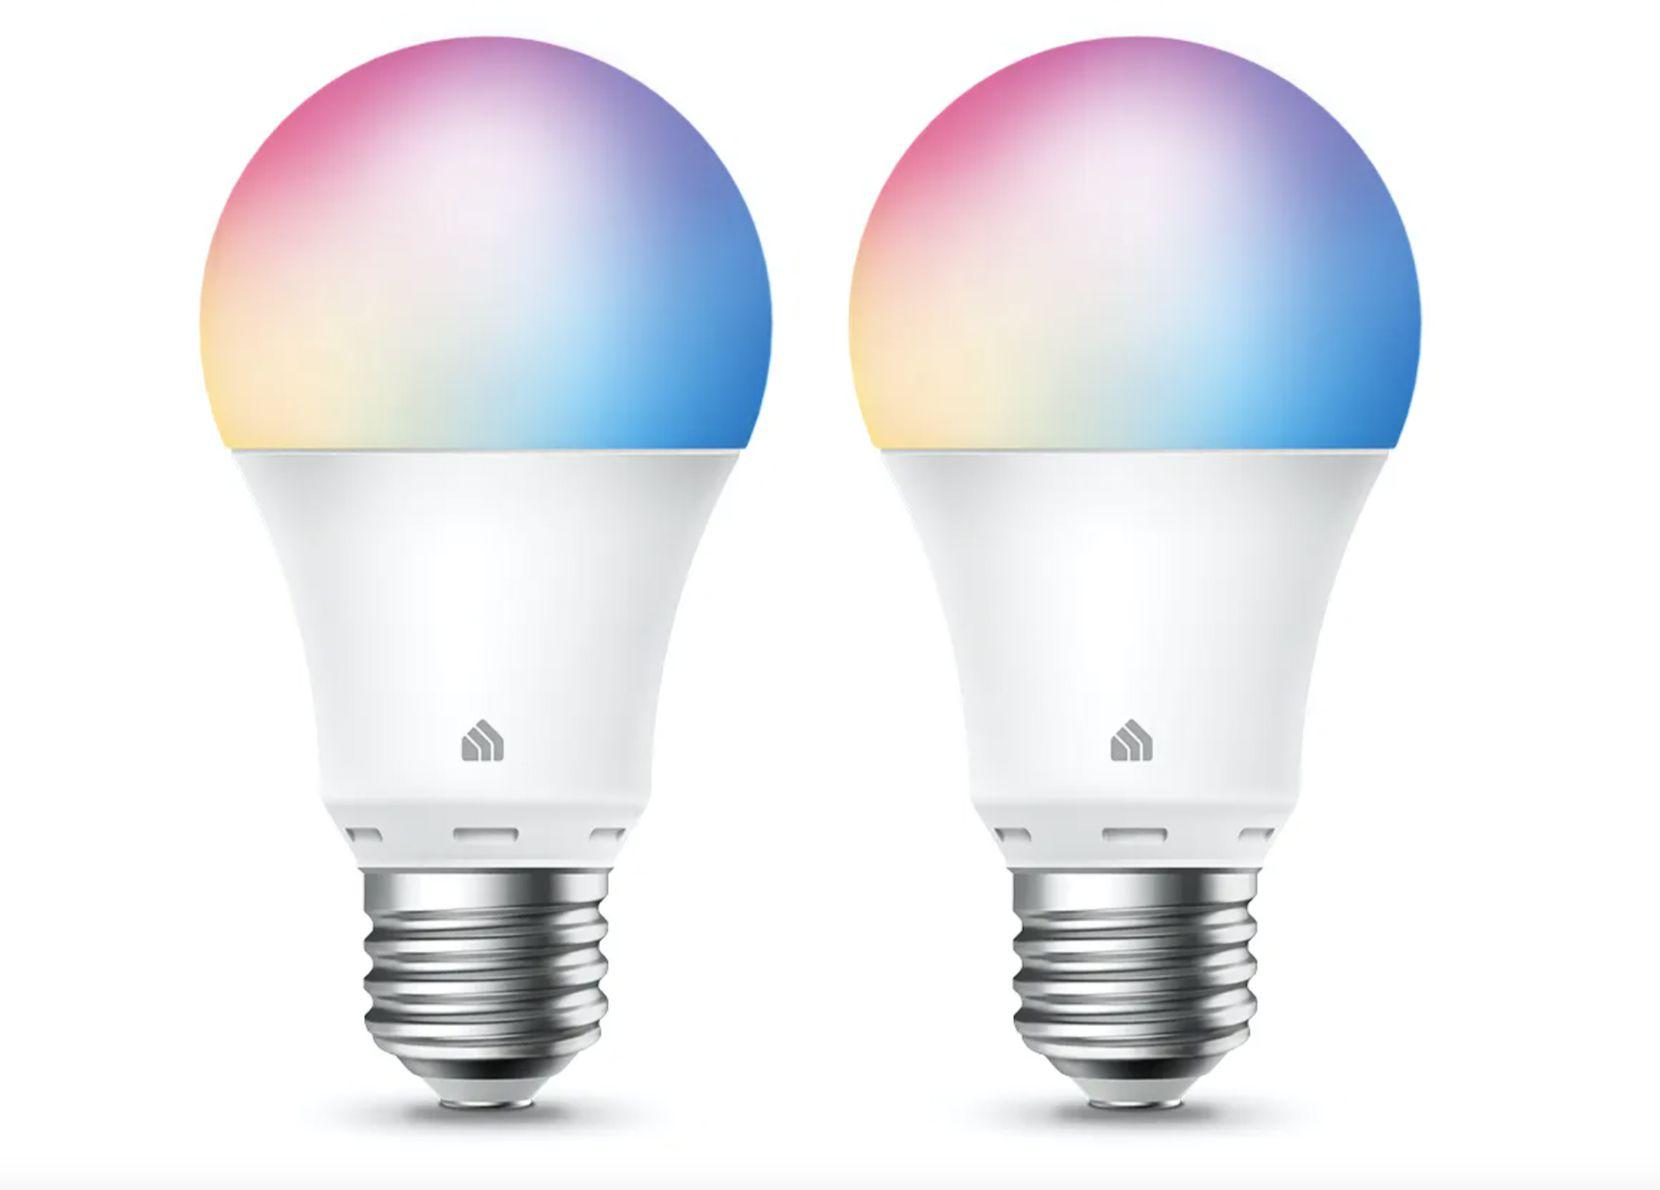 Kasa Smart Wi-Fi Light Bulb (multicolor)